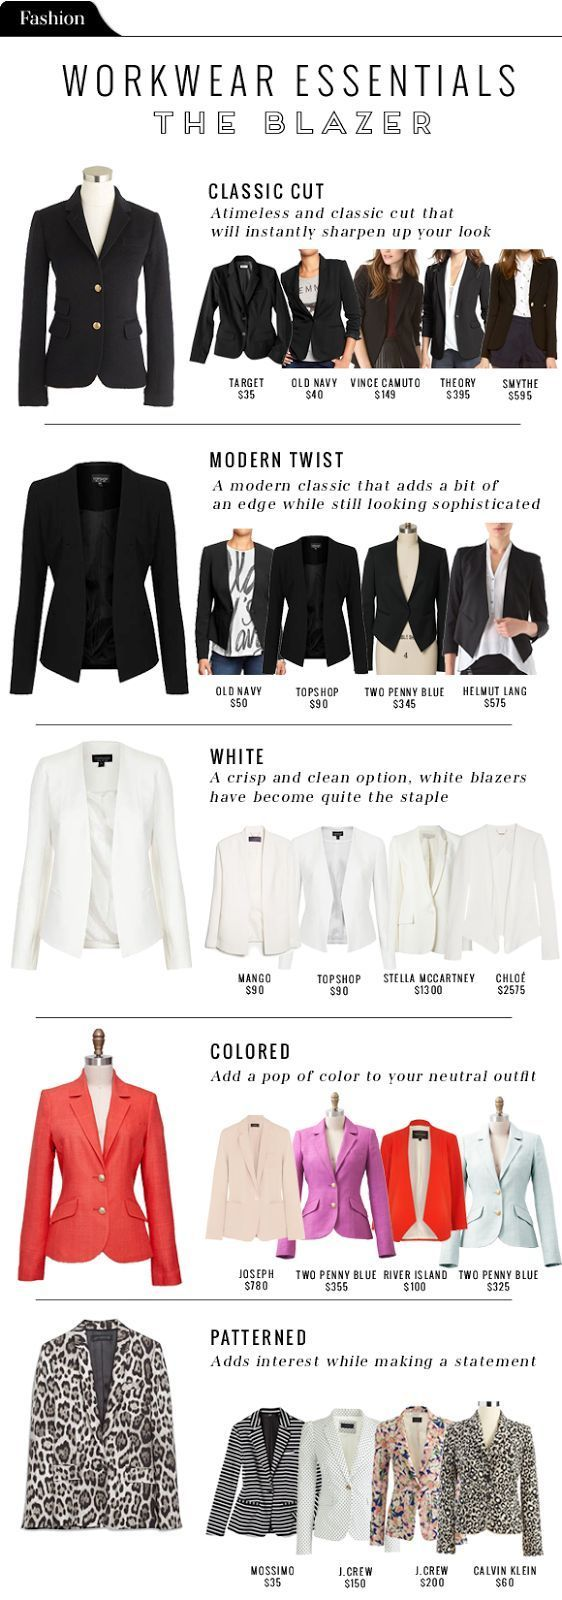 Fashion File: Workwear essentials - The Blazer - The Vault Files: NextStep Hub | Entrepreneur's Style Guide